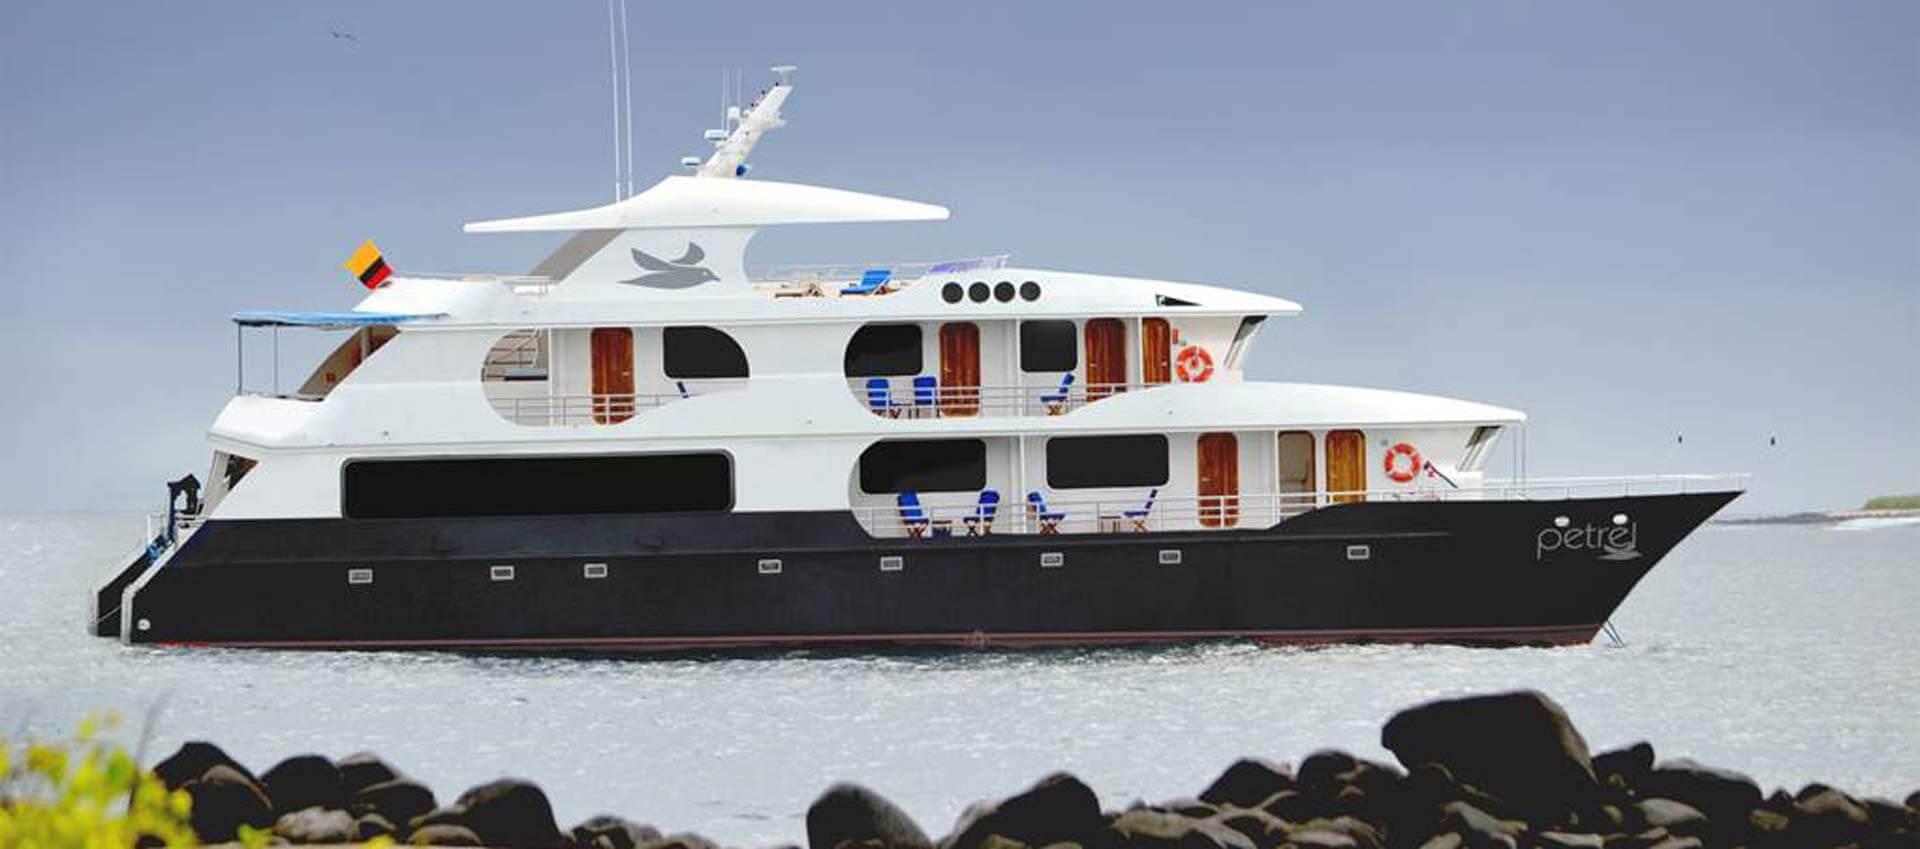 Petrel Luxury Galapagos Catamaran